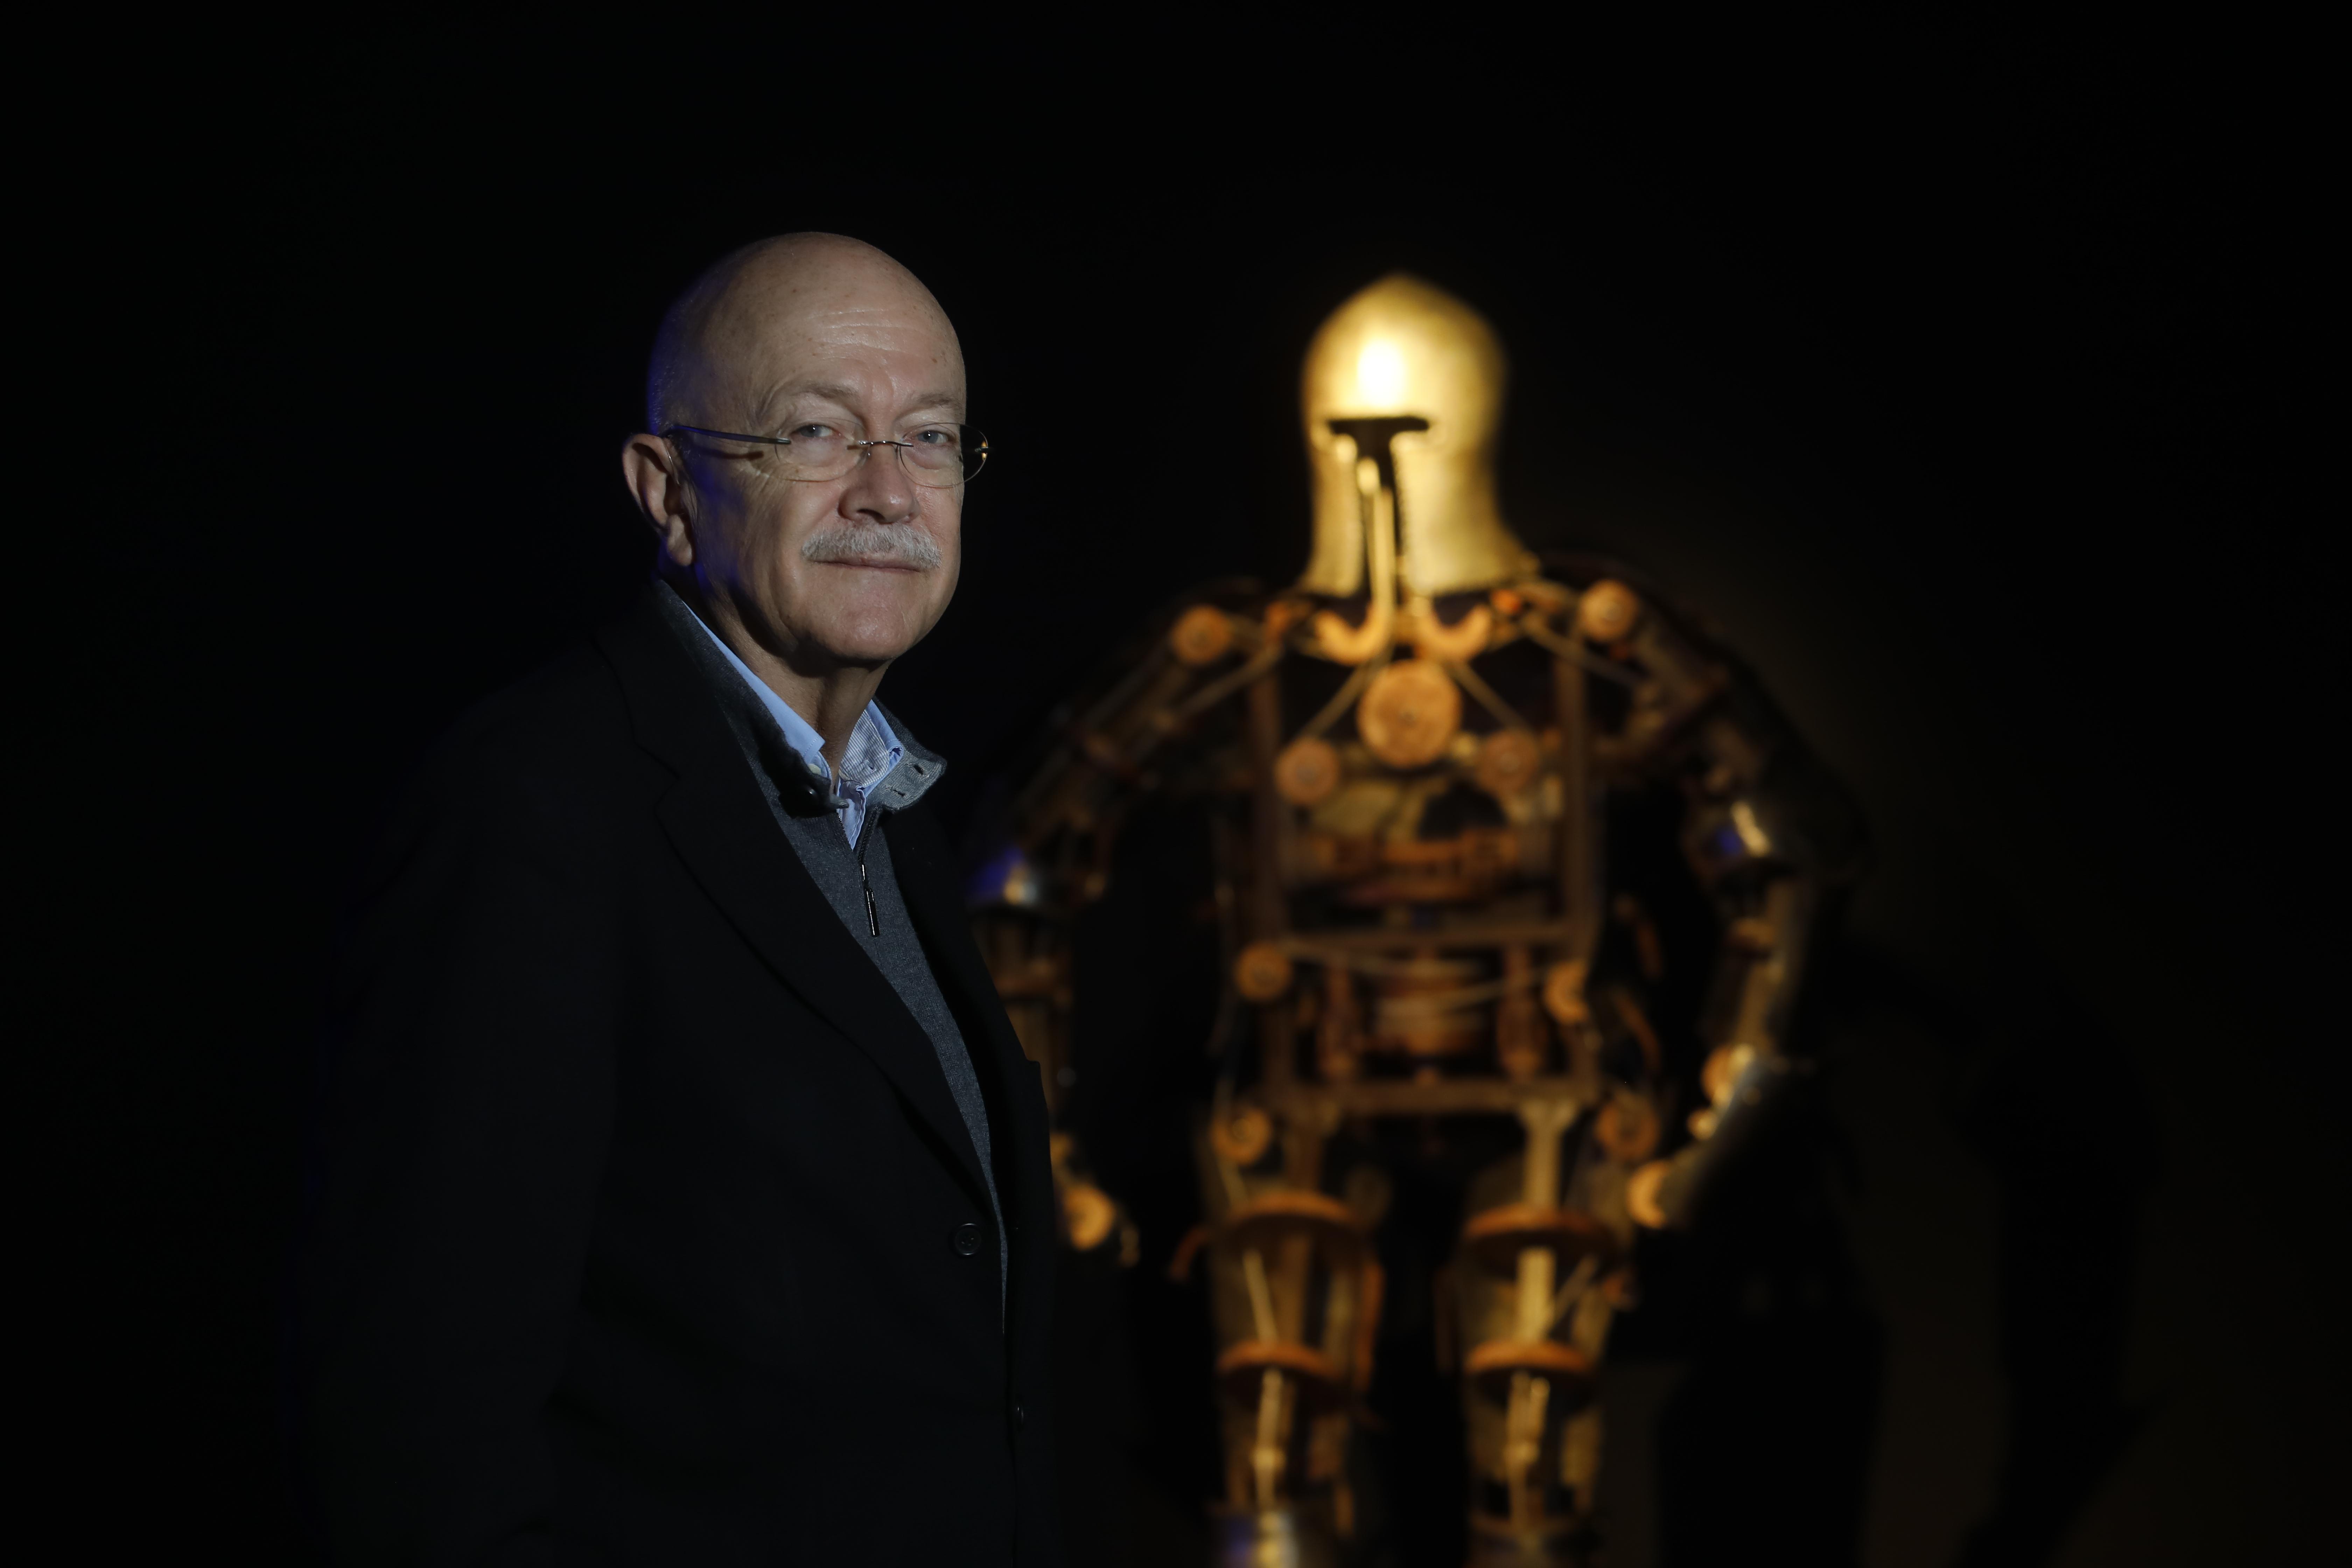 Andrés Ortega, experto en robótica. (Fotos: Carlos Tamashiro).